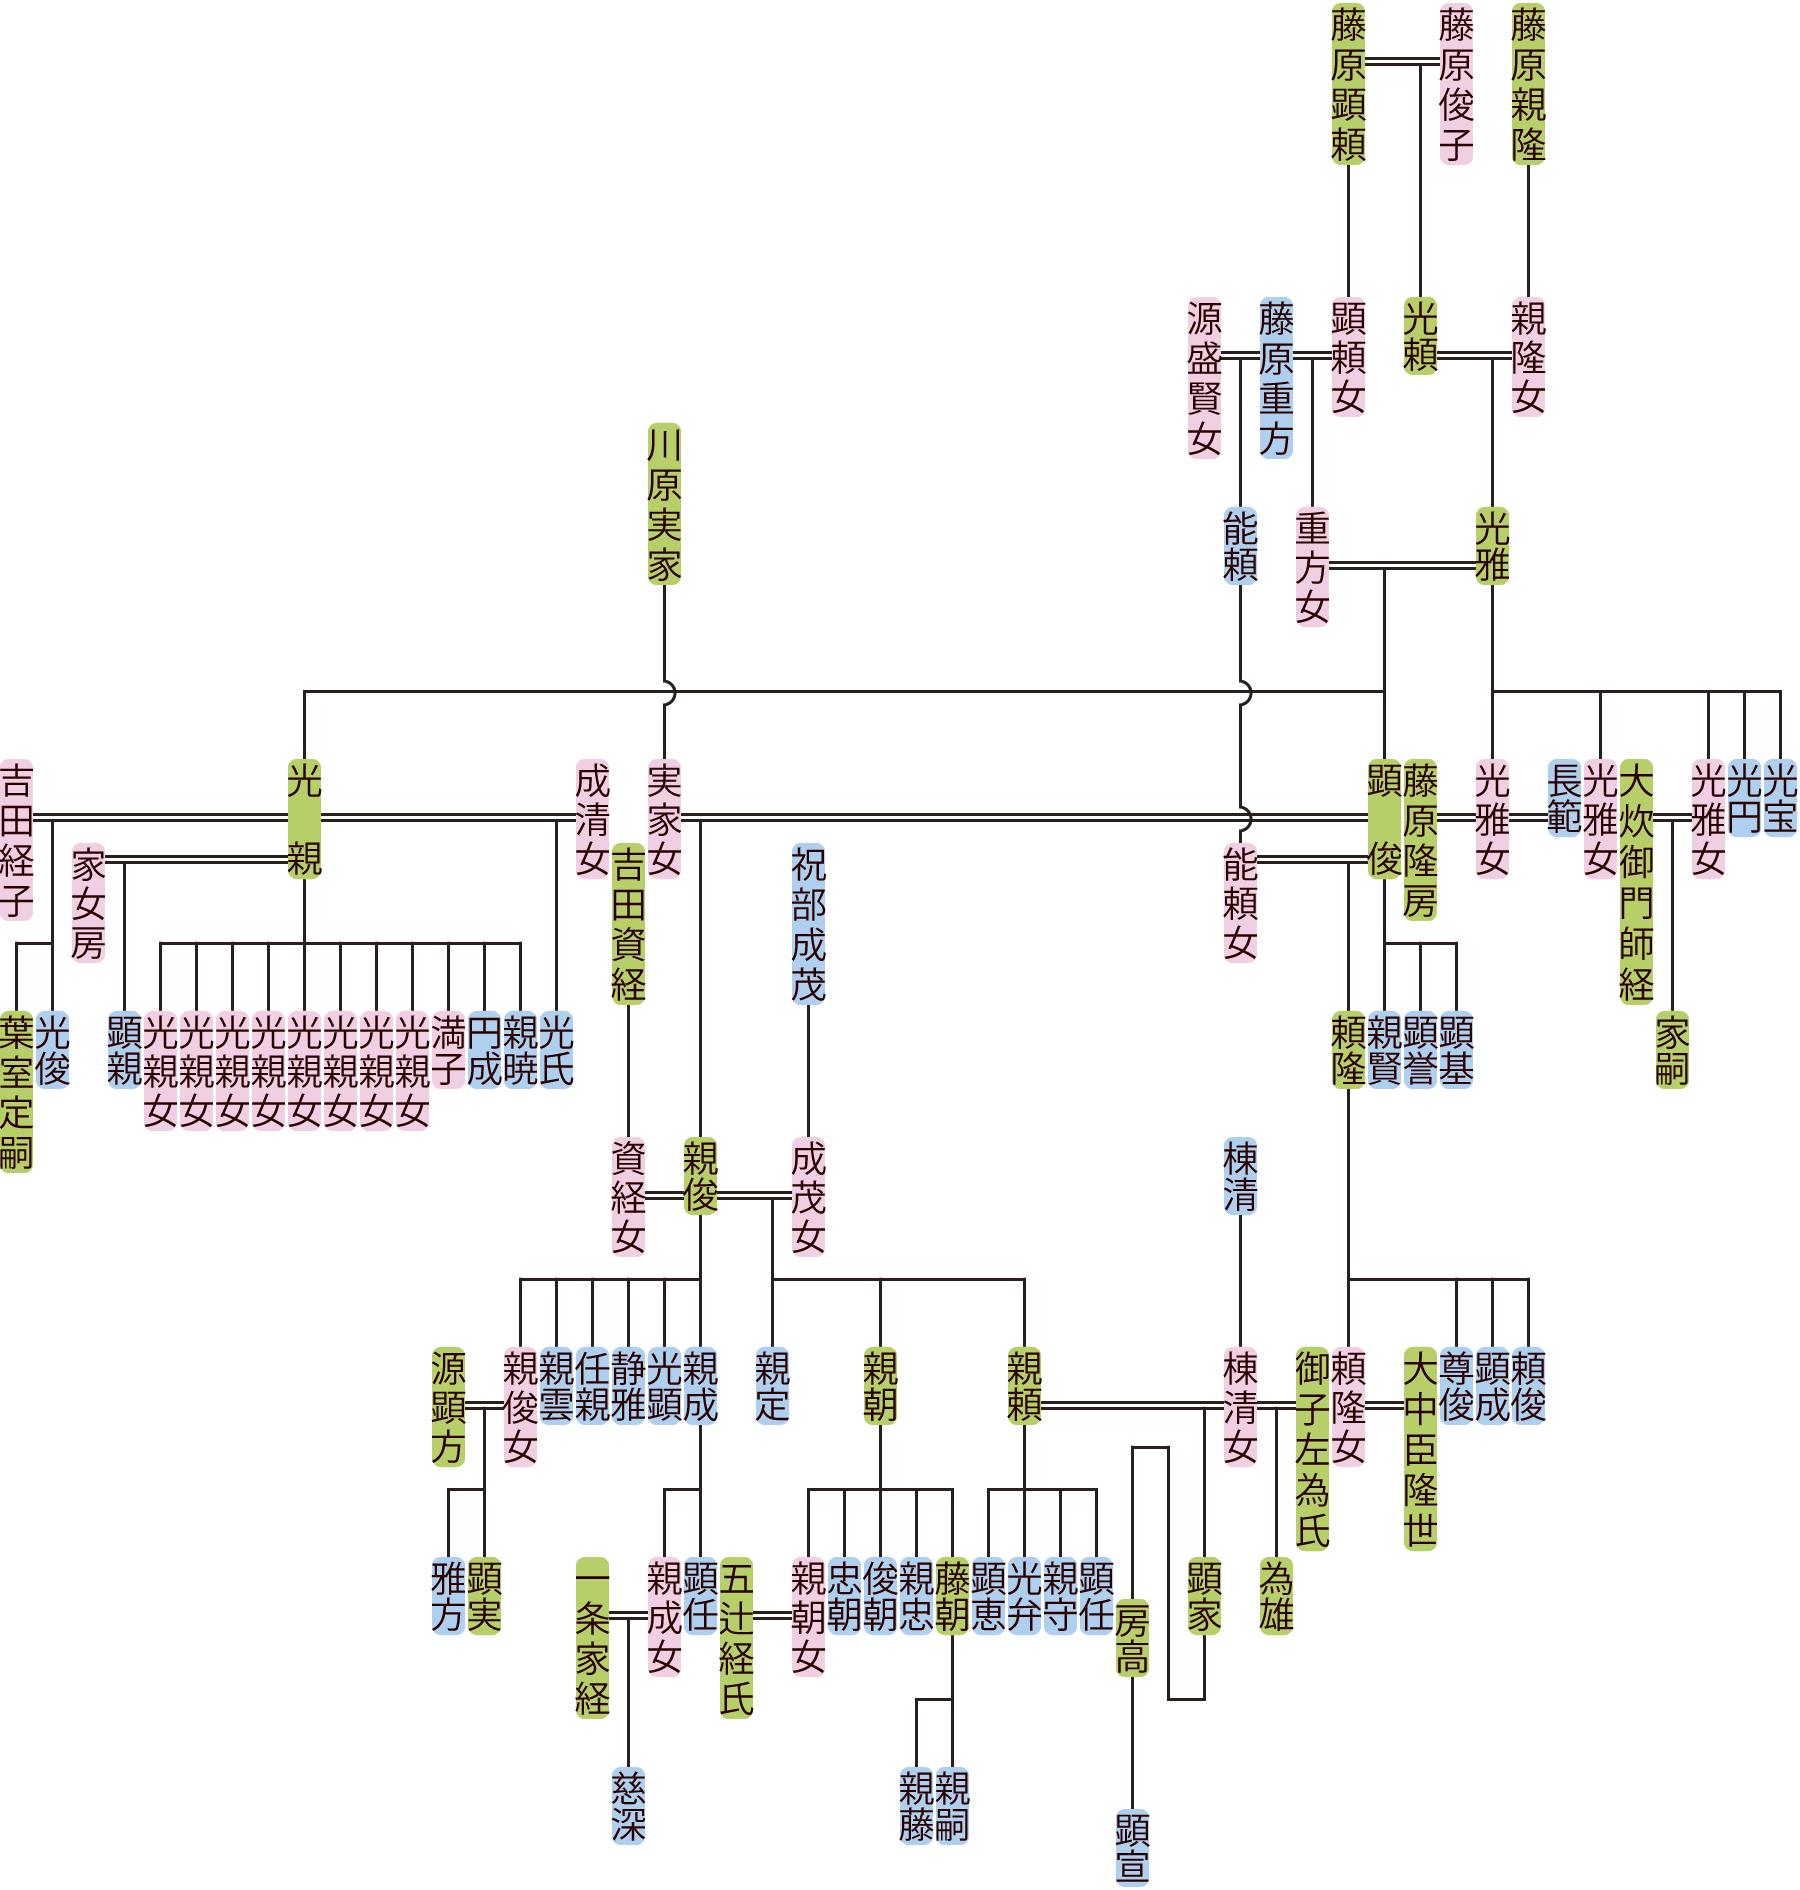 藤原光雅の系図